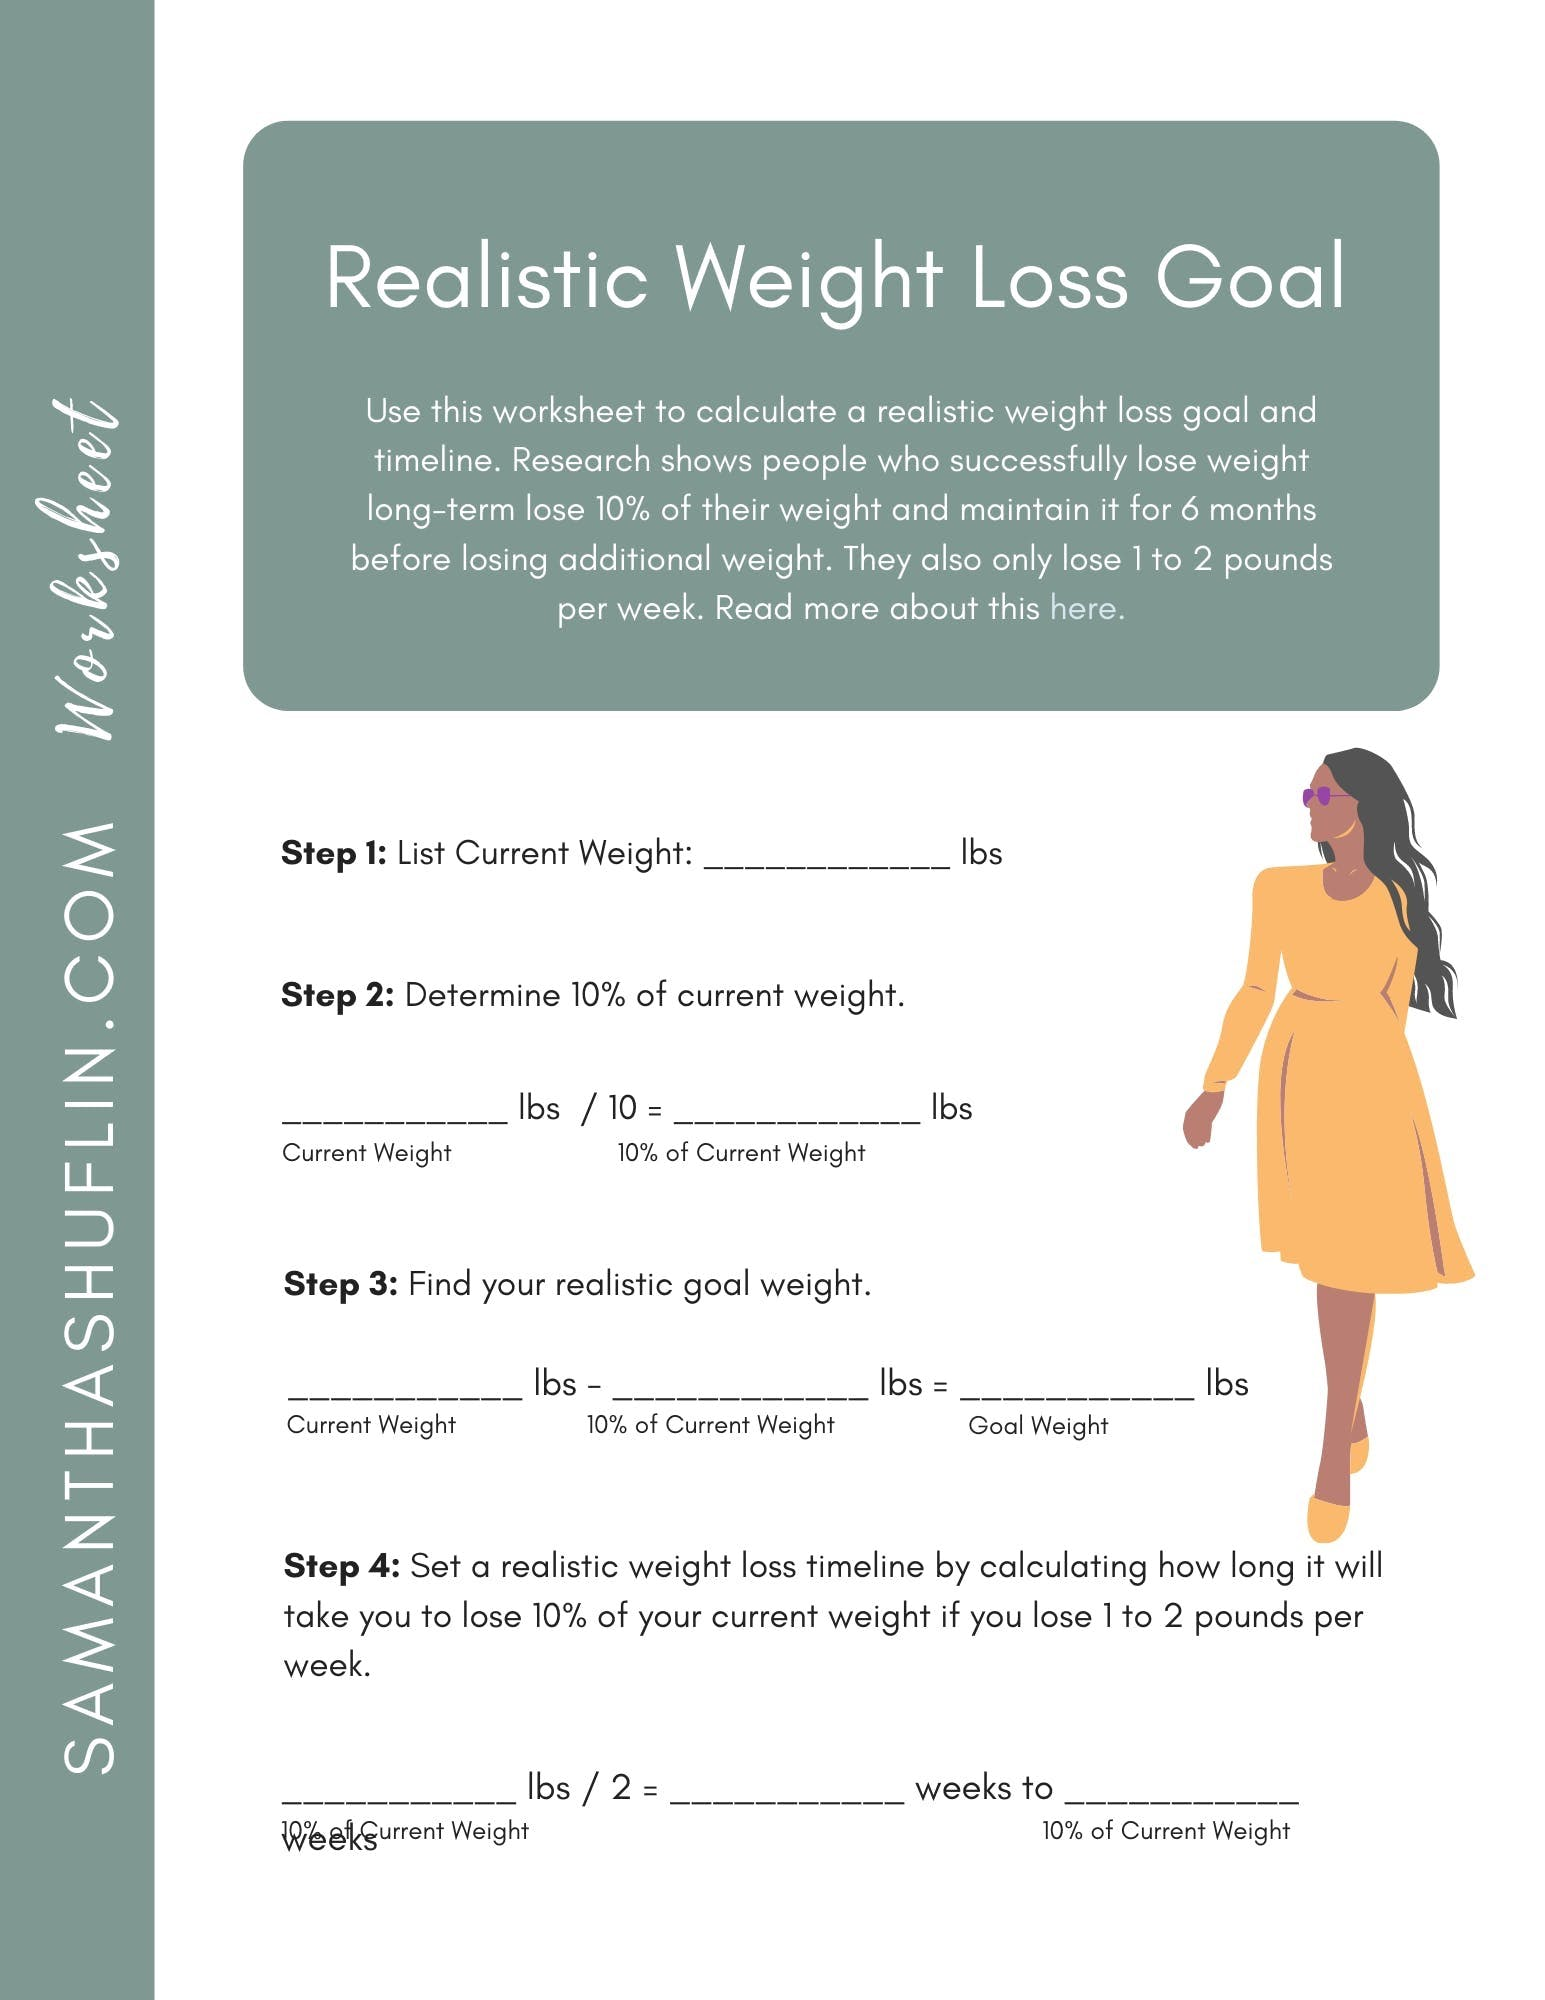 Setting Realistic Weight Loss Goals: Set Realistic Weight Loss Goals With This Free Worksheet